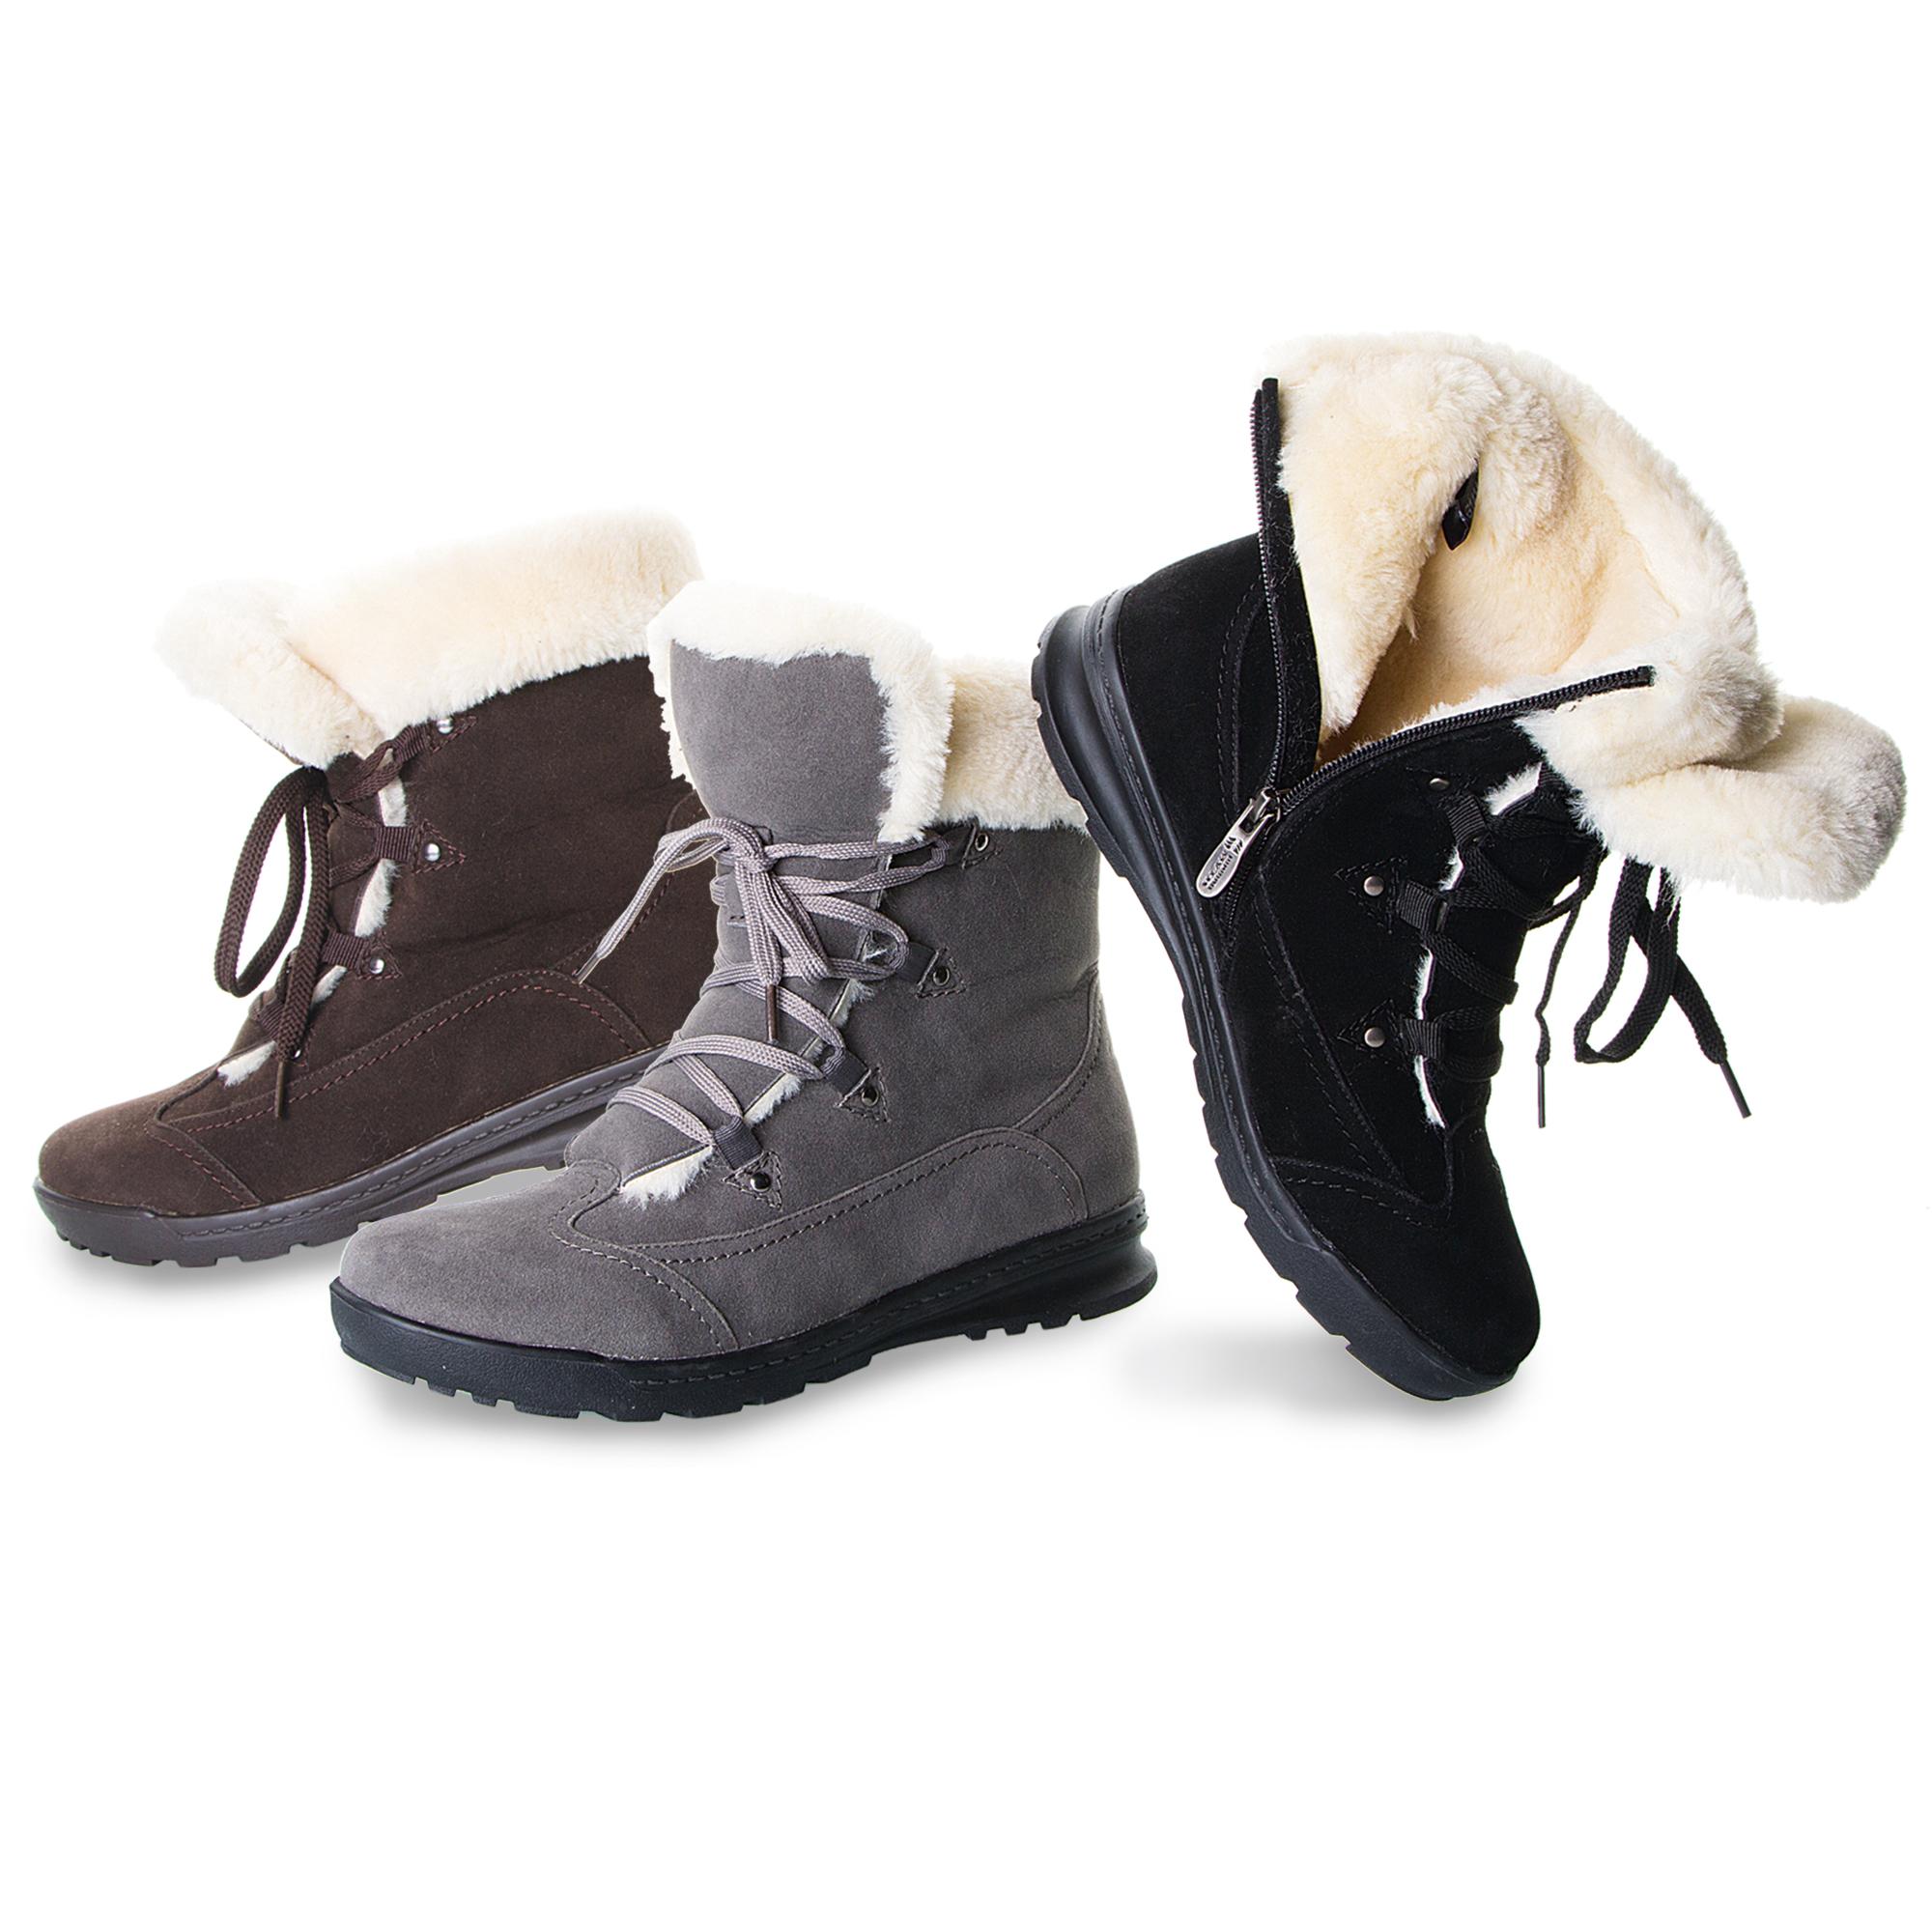 Зимние ботинки «Гренландия»